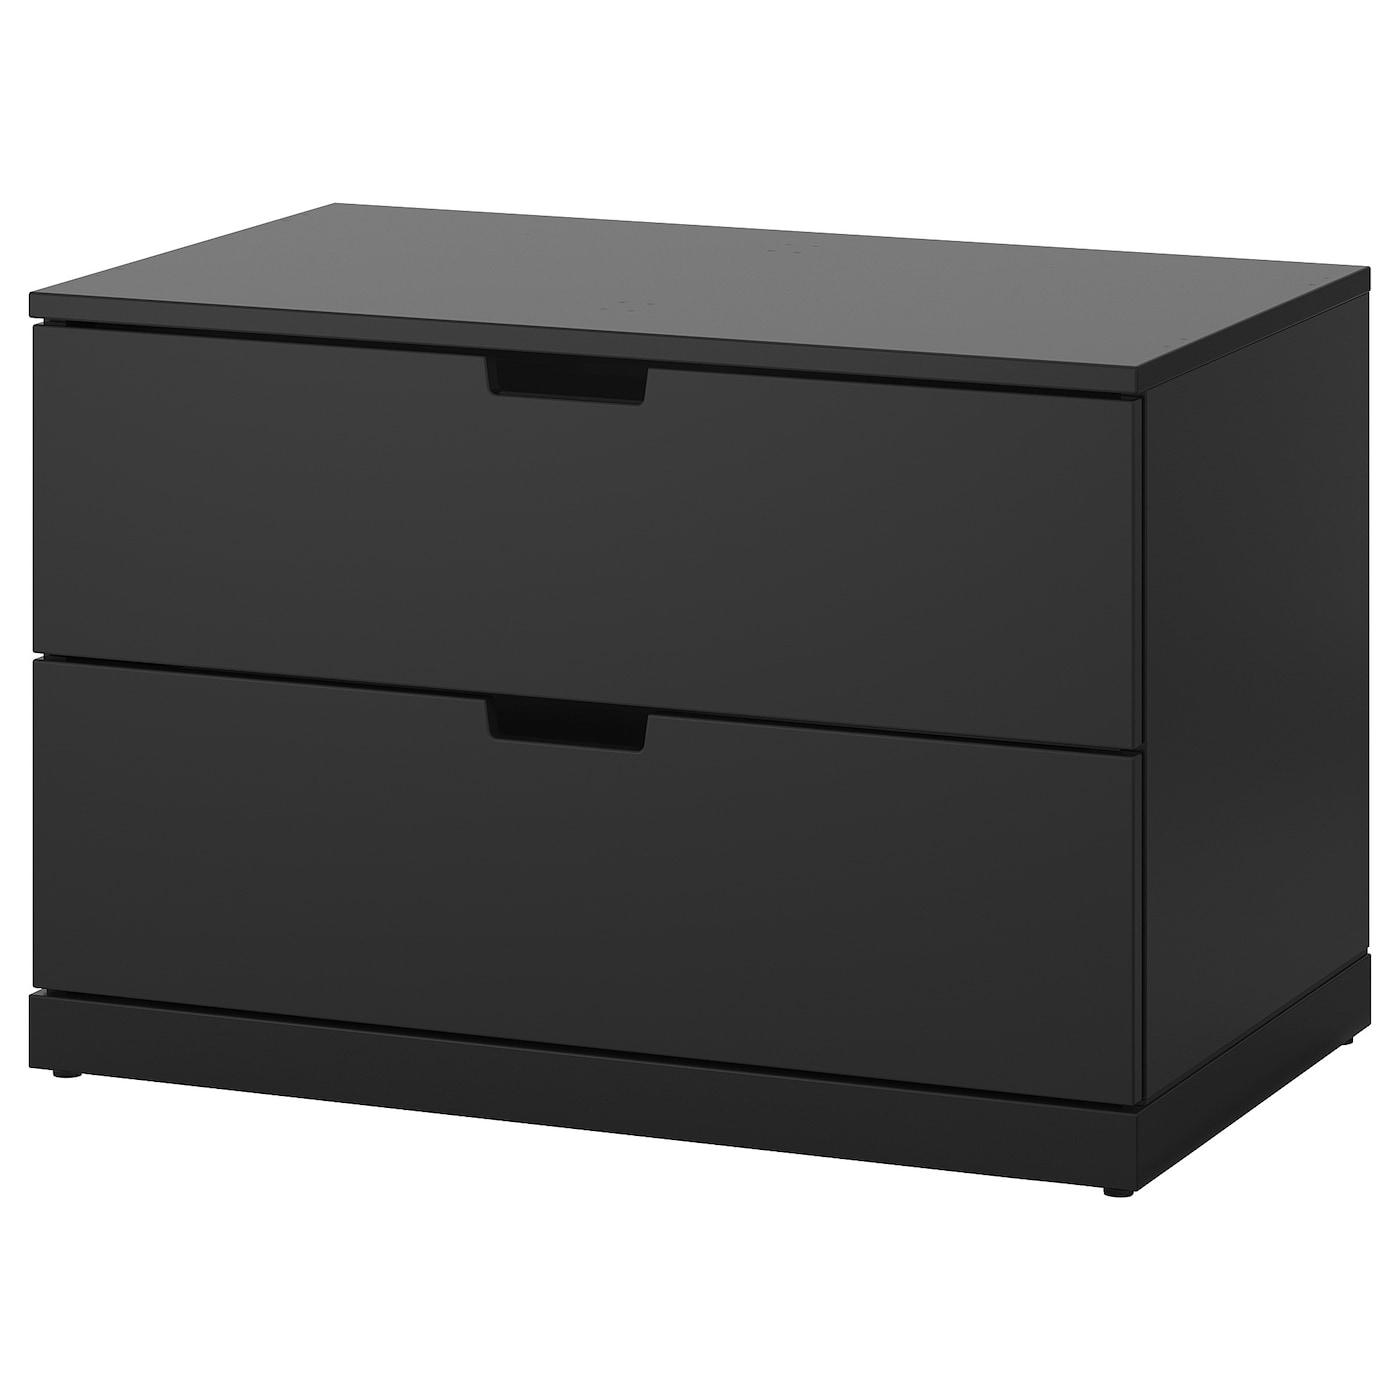 nordli commode 2 tiroirs anthracite 80 x 54 cm ikea. Black Bedroom Furniture Sets. Home Design Ideas